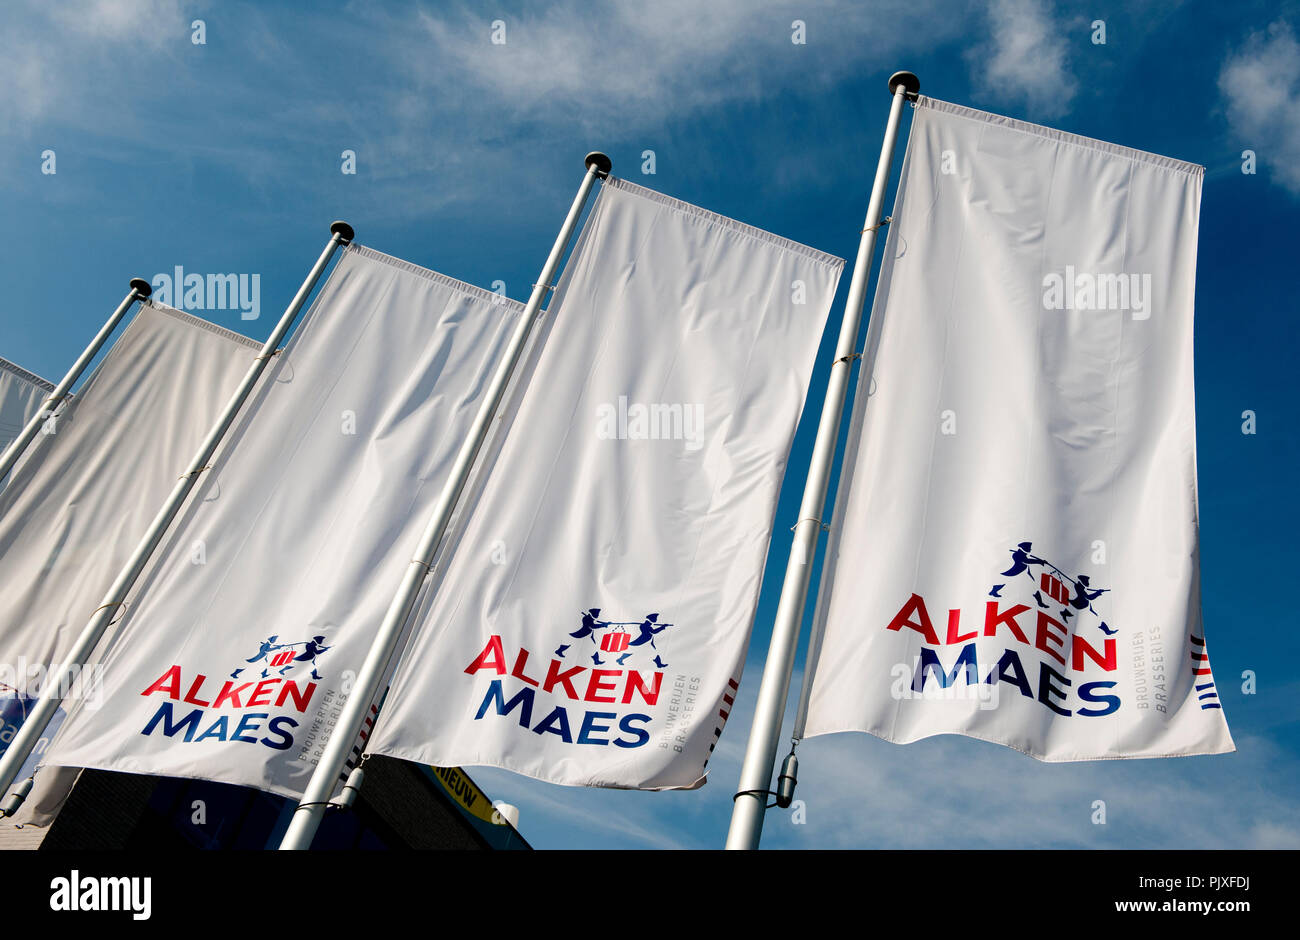 The headquarters of the brewery concern Alken-Maes in Mechelen (Belgium, 05/08/2014) - Stock Image